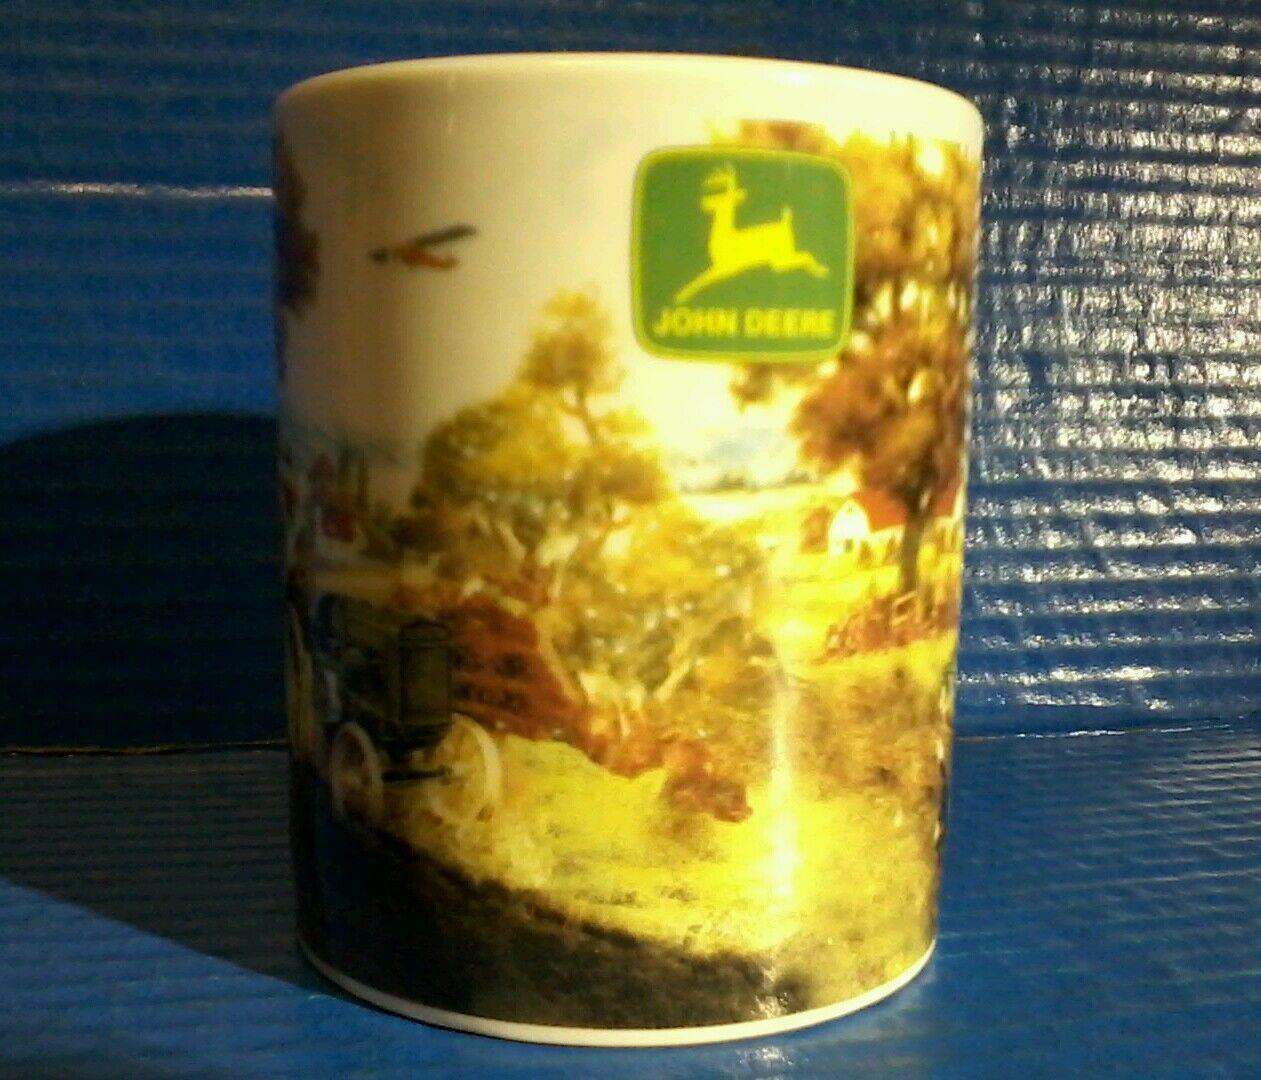 John Deere Tractor & Airplane Farm Dog Ceramic Coffee Mug Cup Gibson Collectible